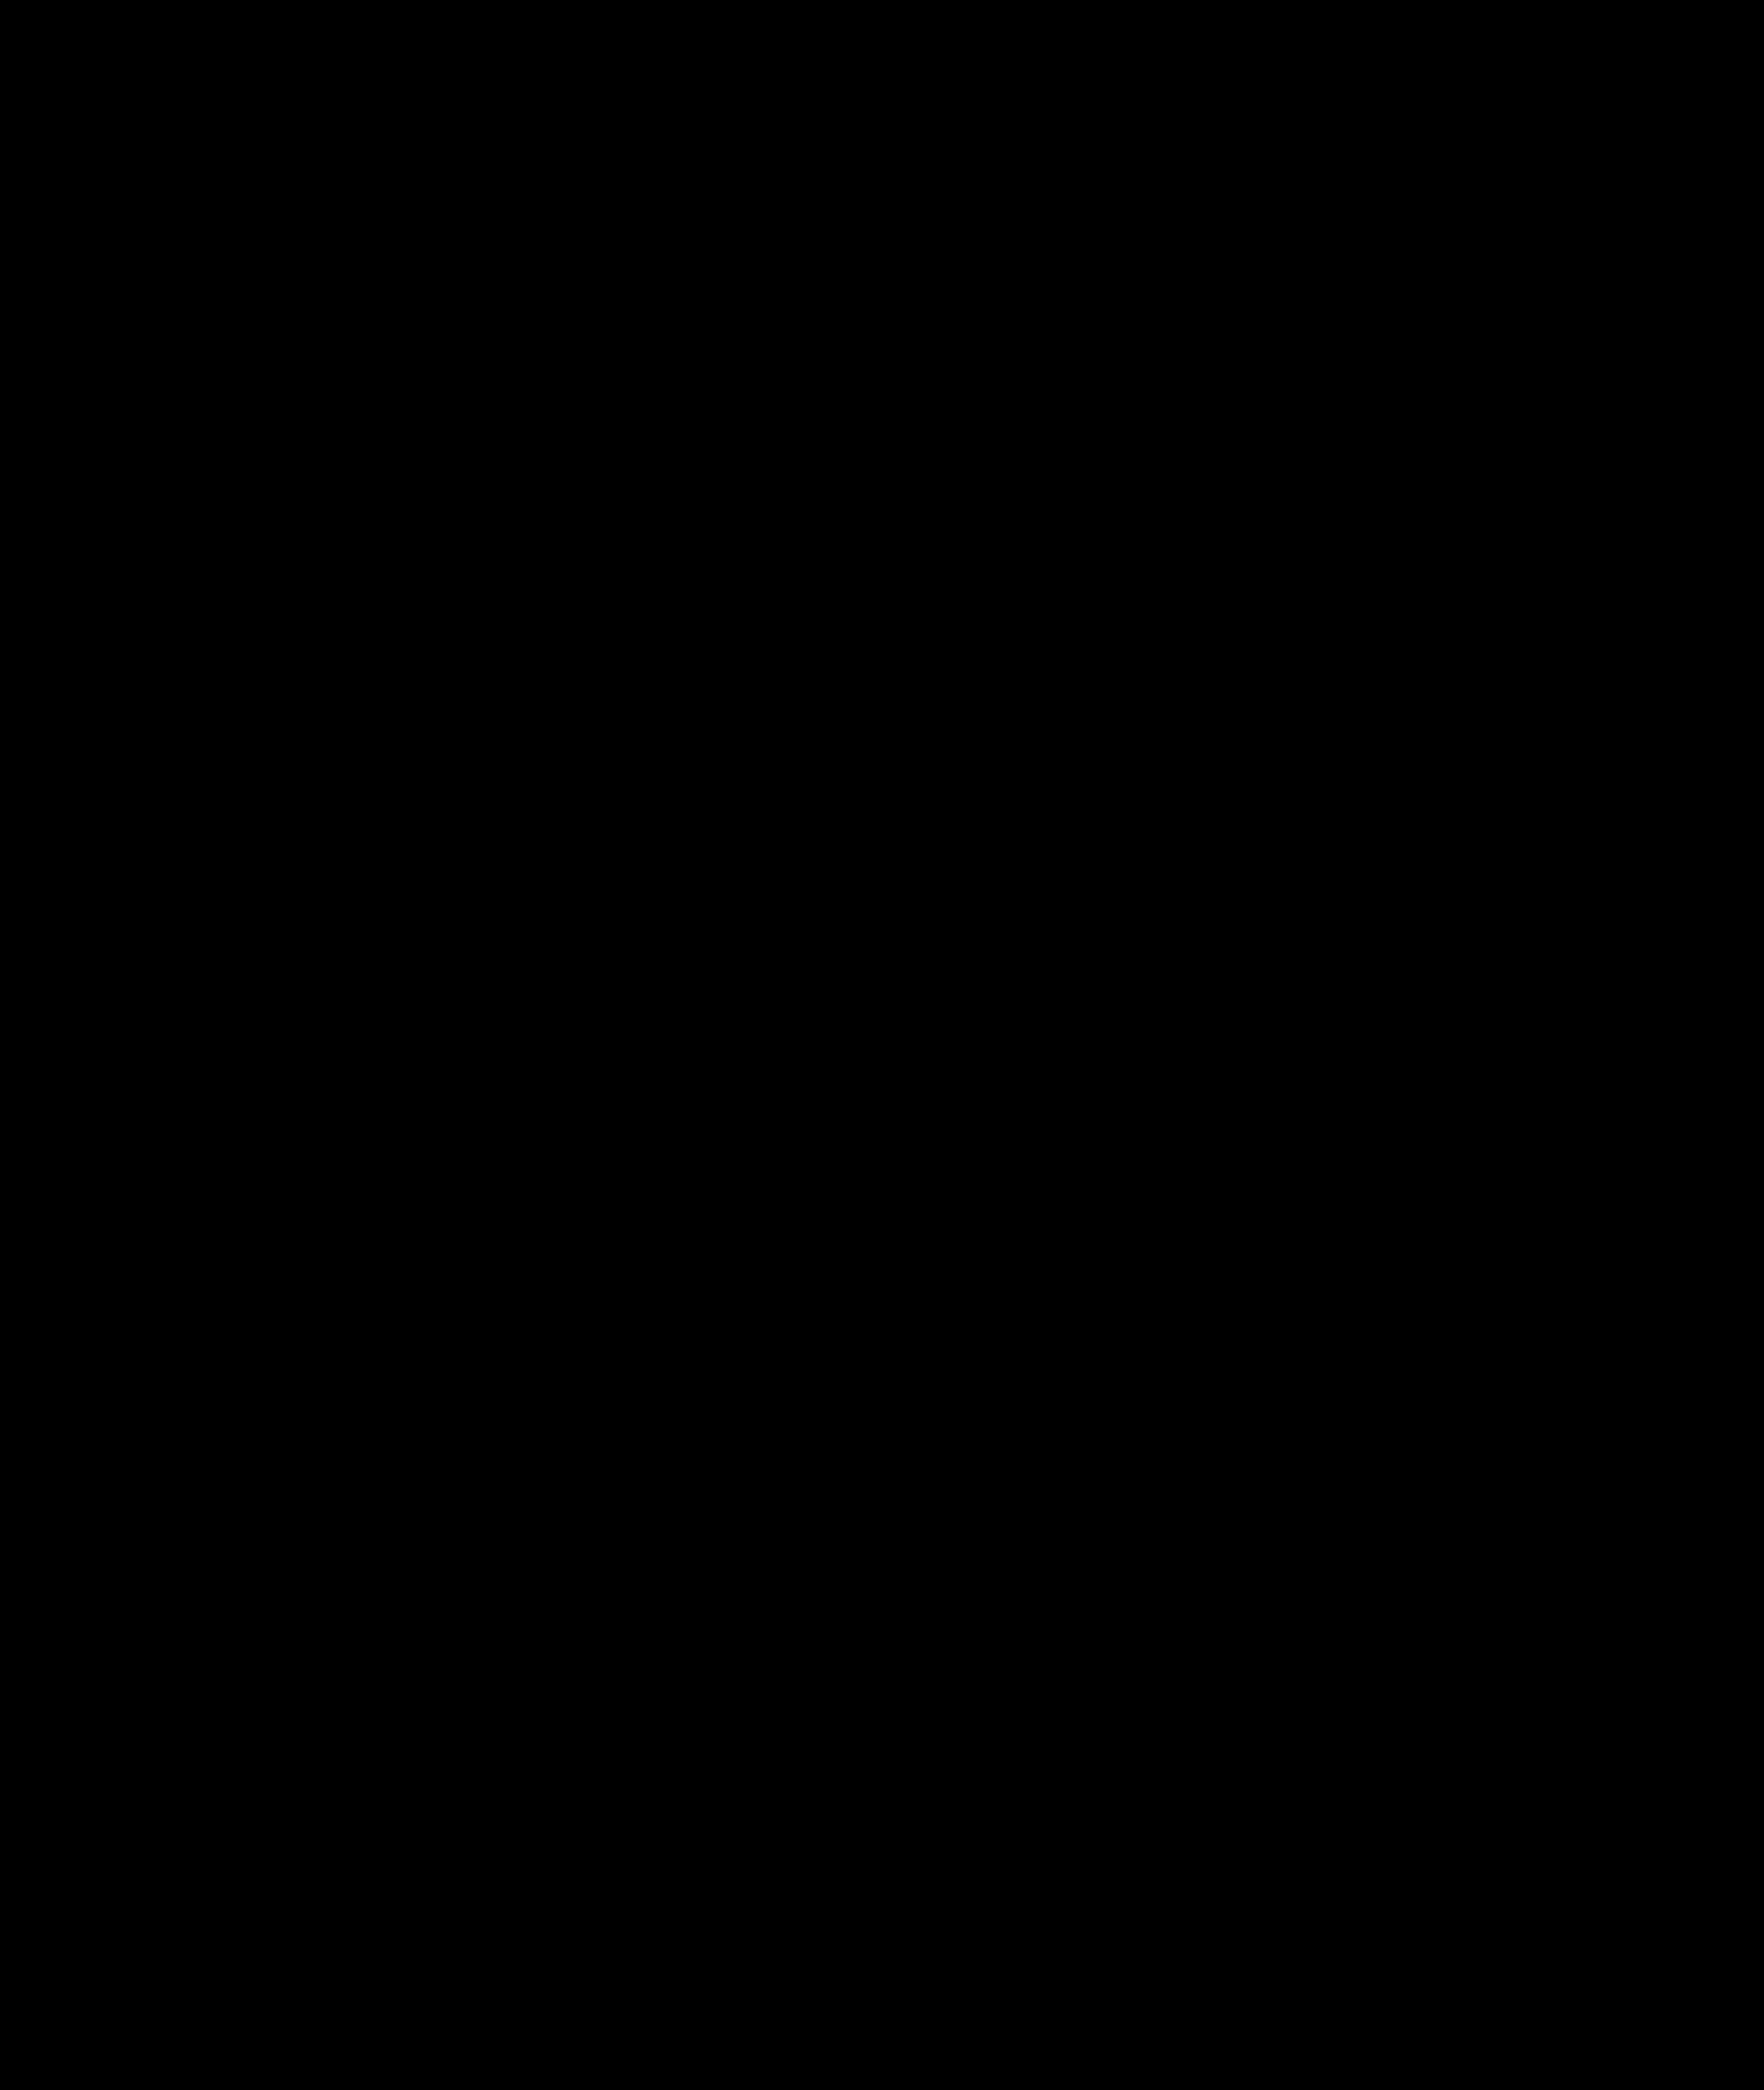 2026x2400 Clipart